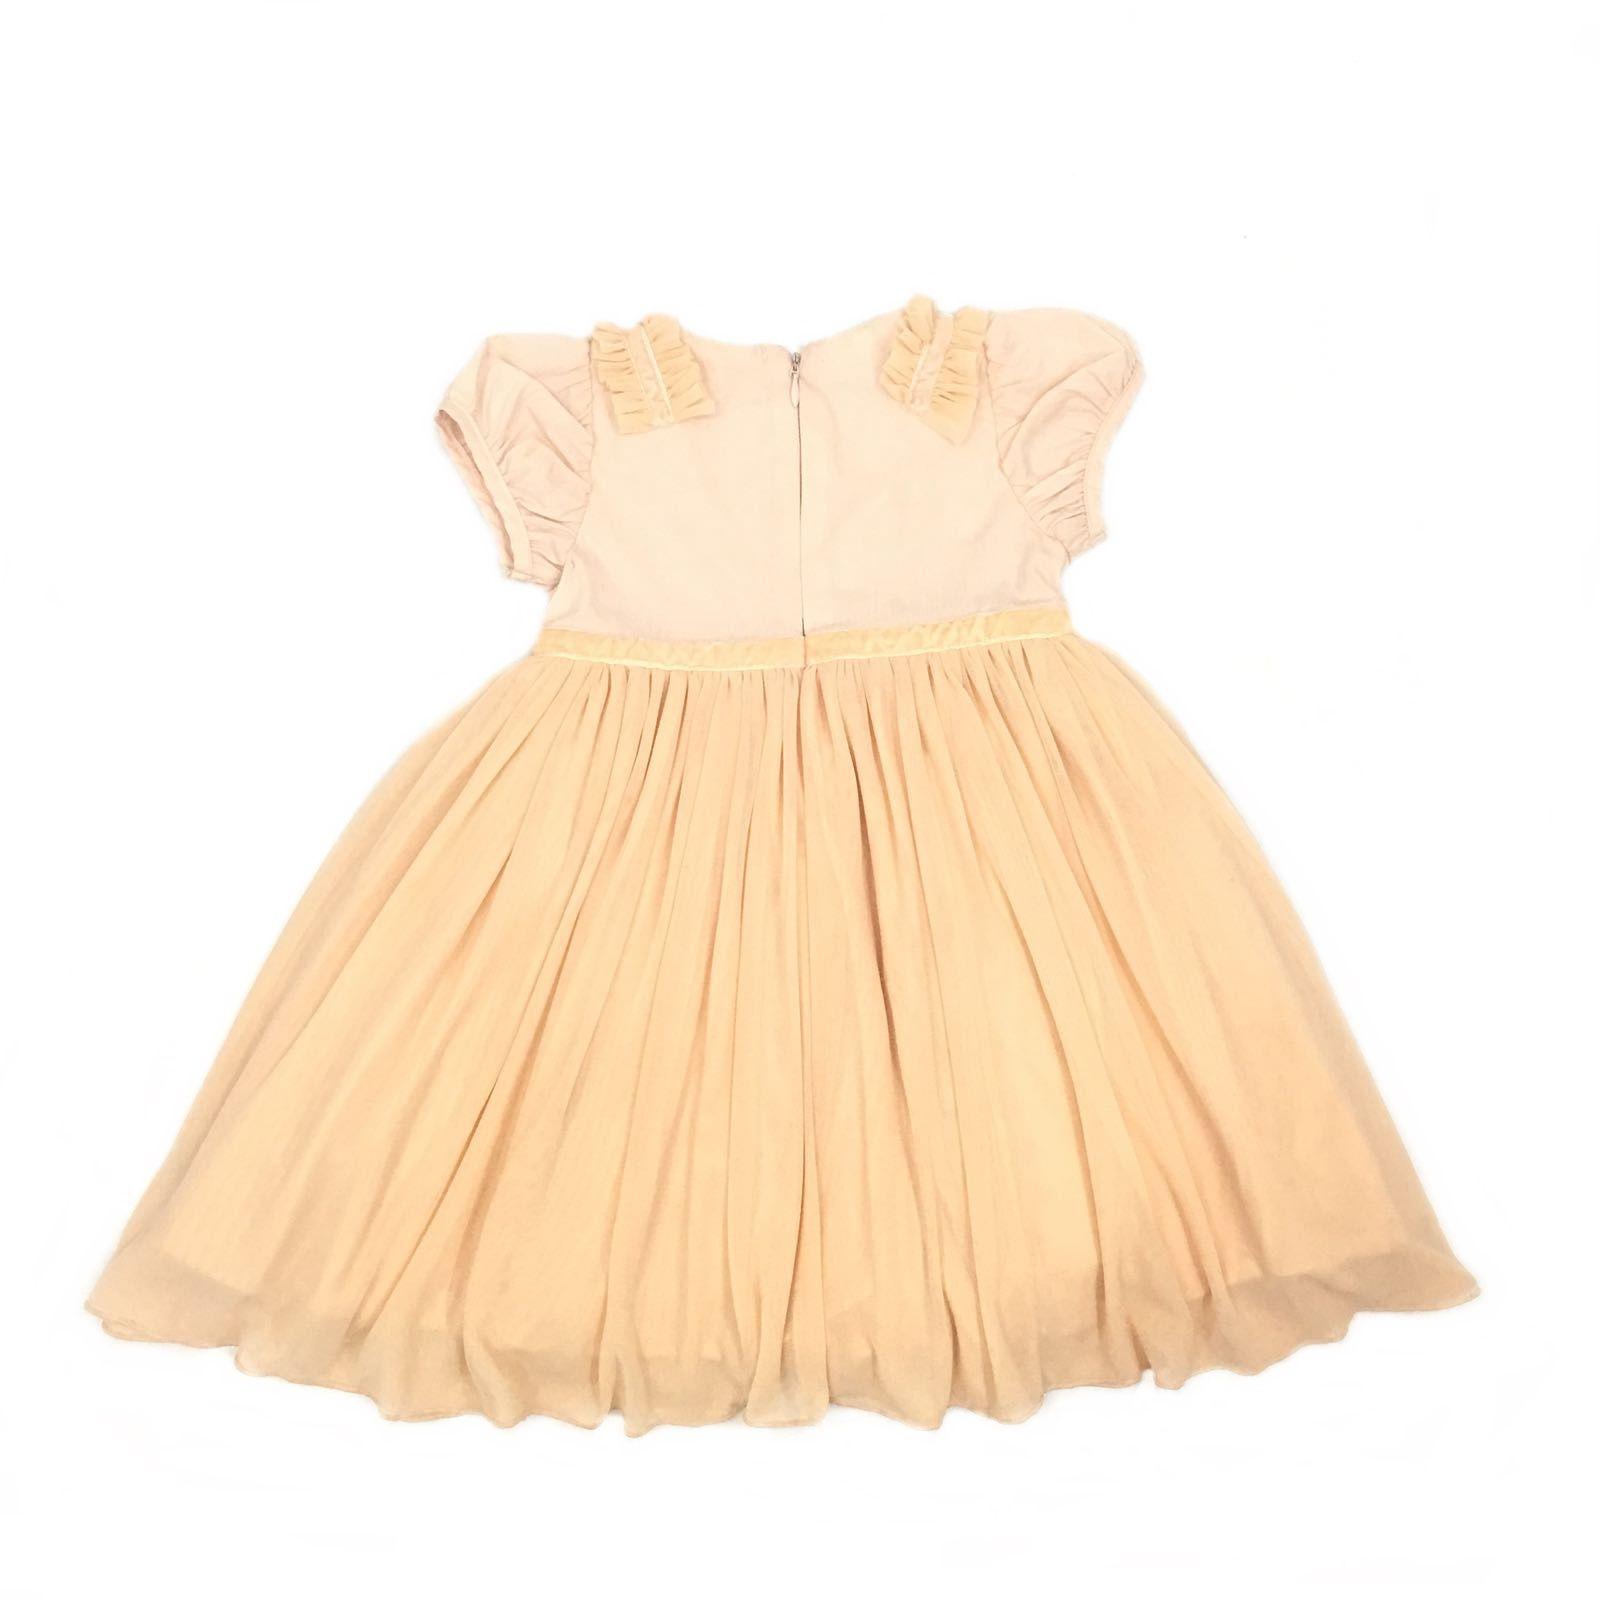 Vestido Petit Cherie 11.04.31116